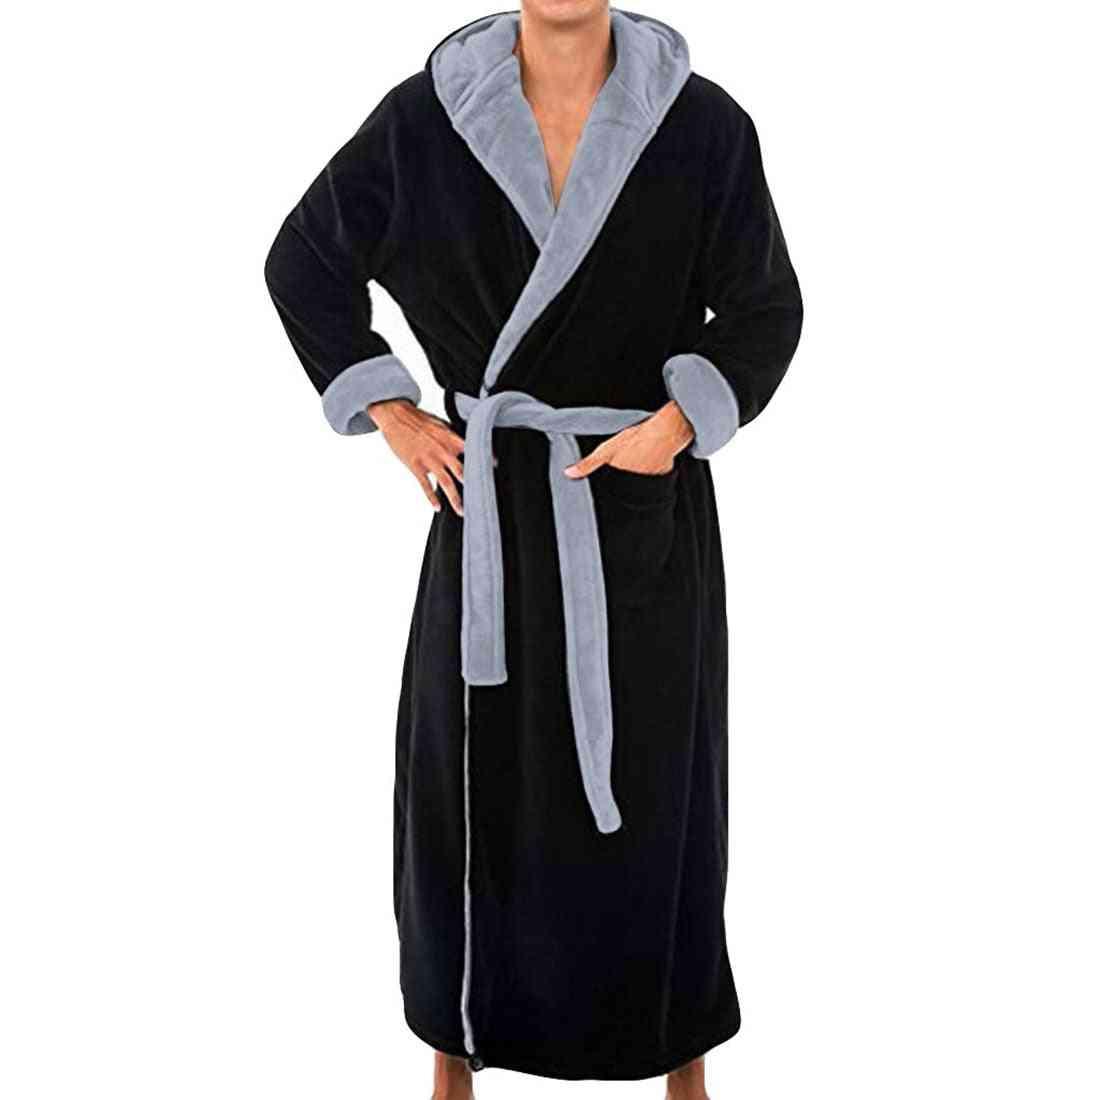 Winter Warm- Thick Lengthened Shawl, Long-sleeved Bathrobe